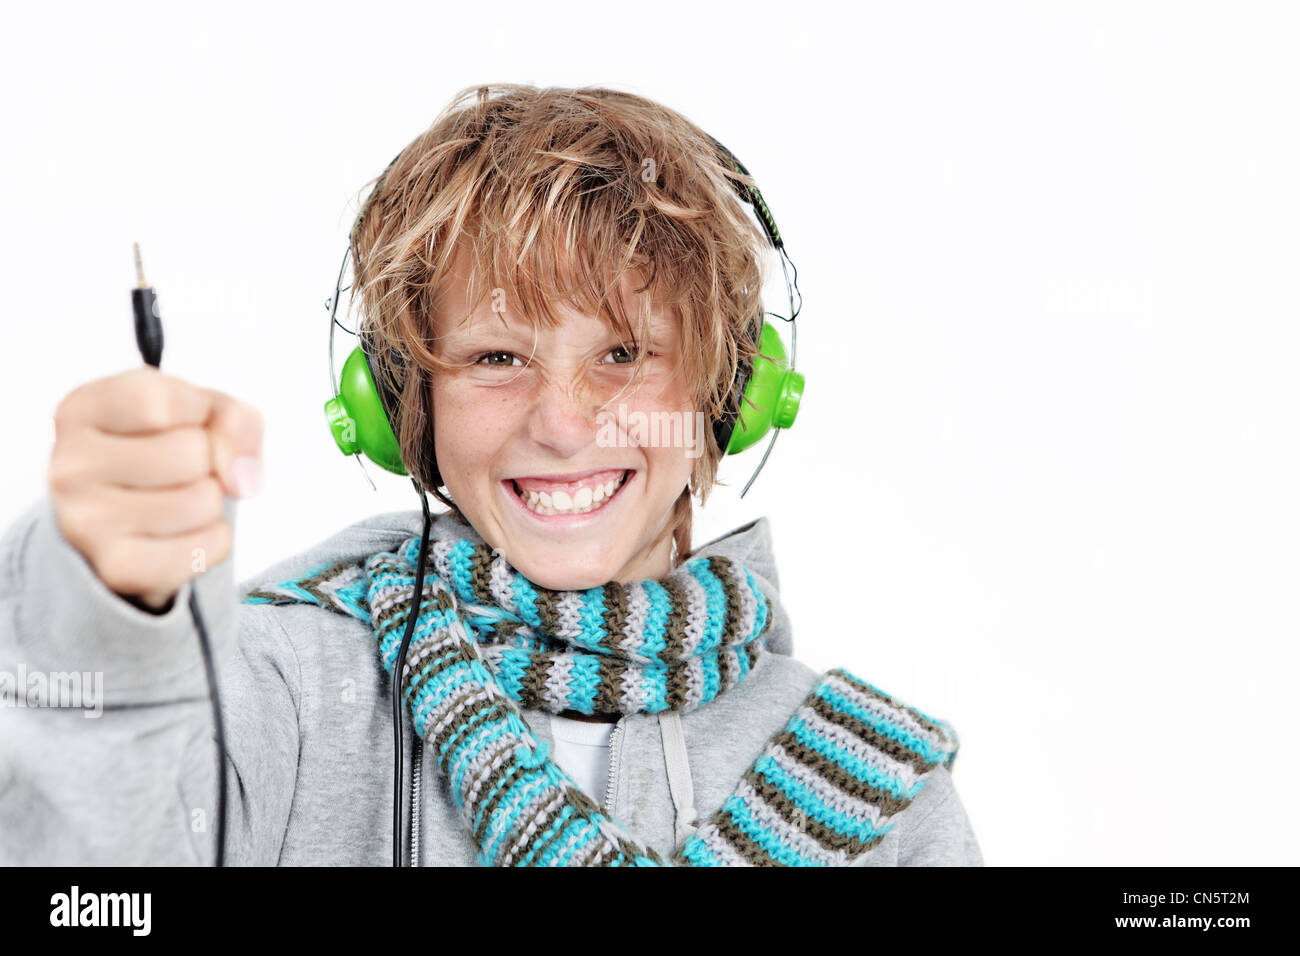 child with headphones - Stock Image